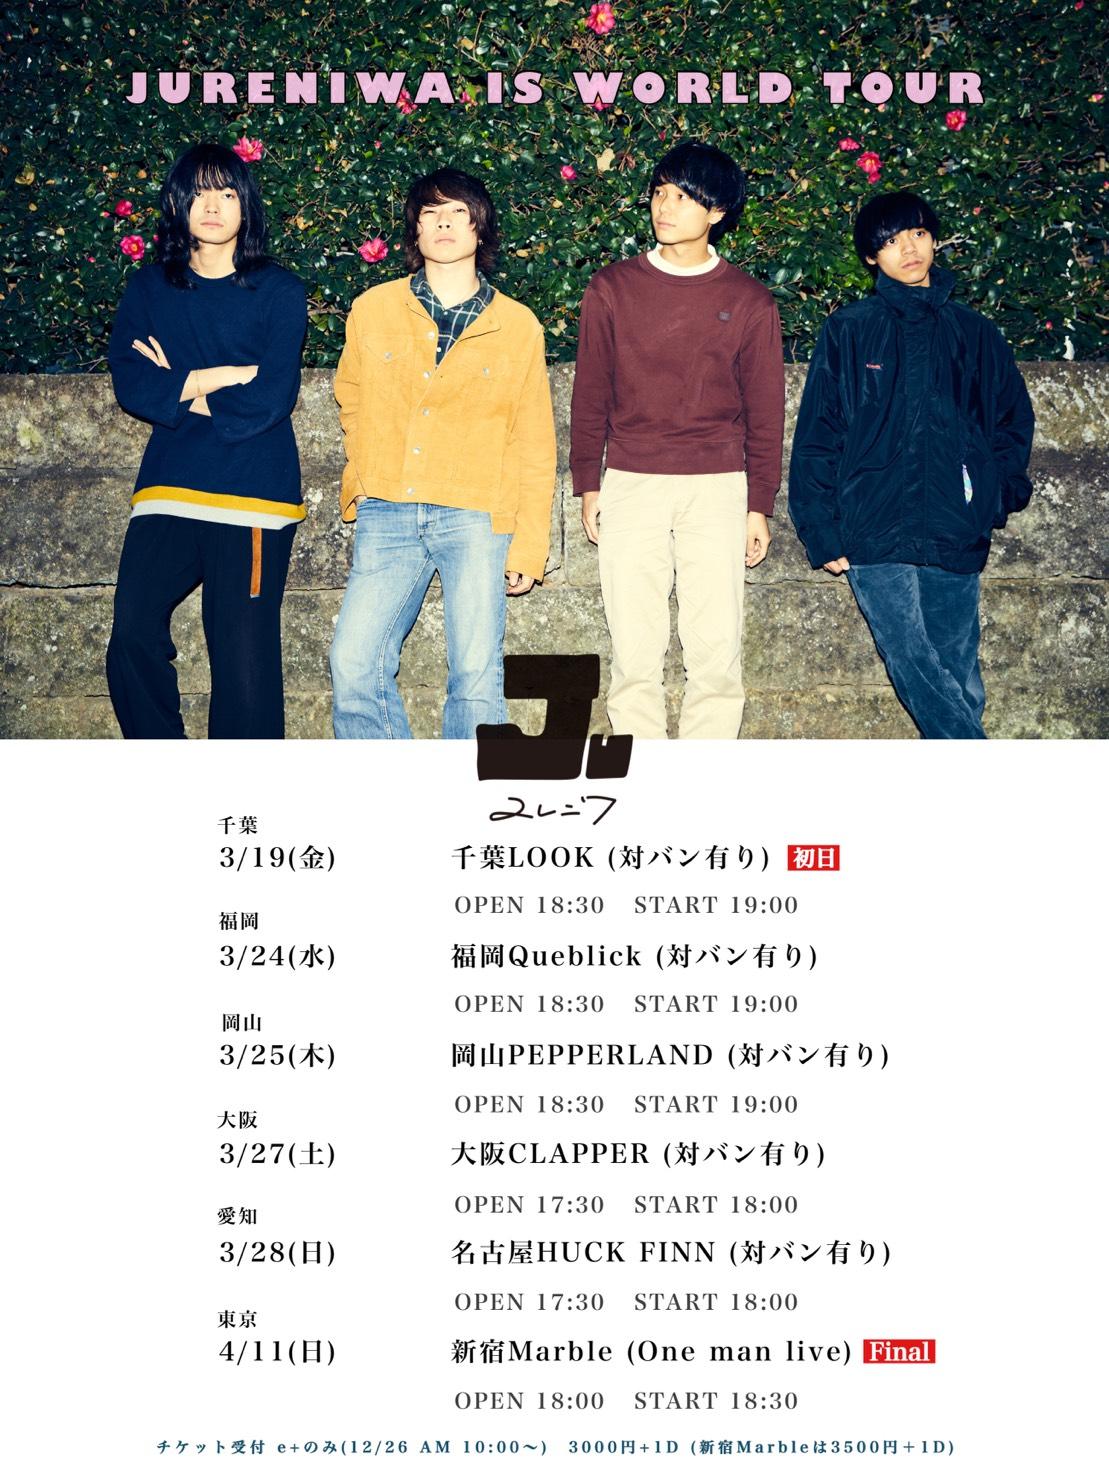 JURENIWA IS WORLD TOUR FINAL